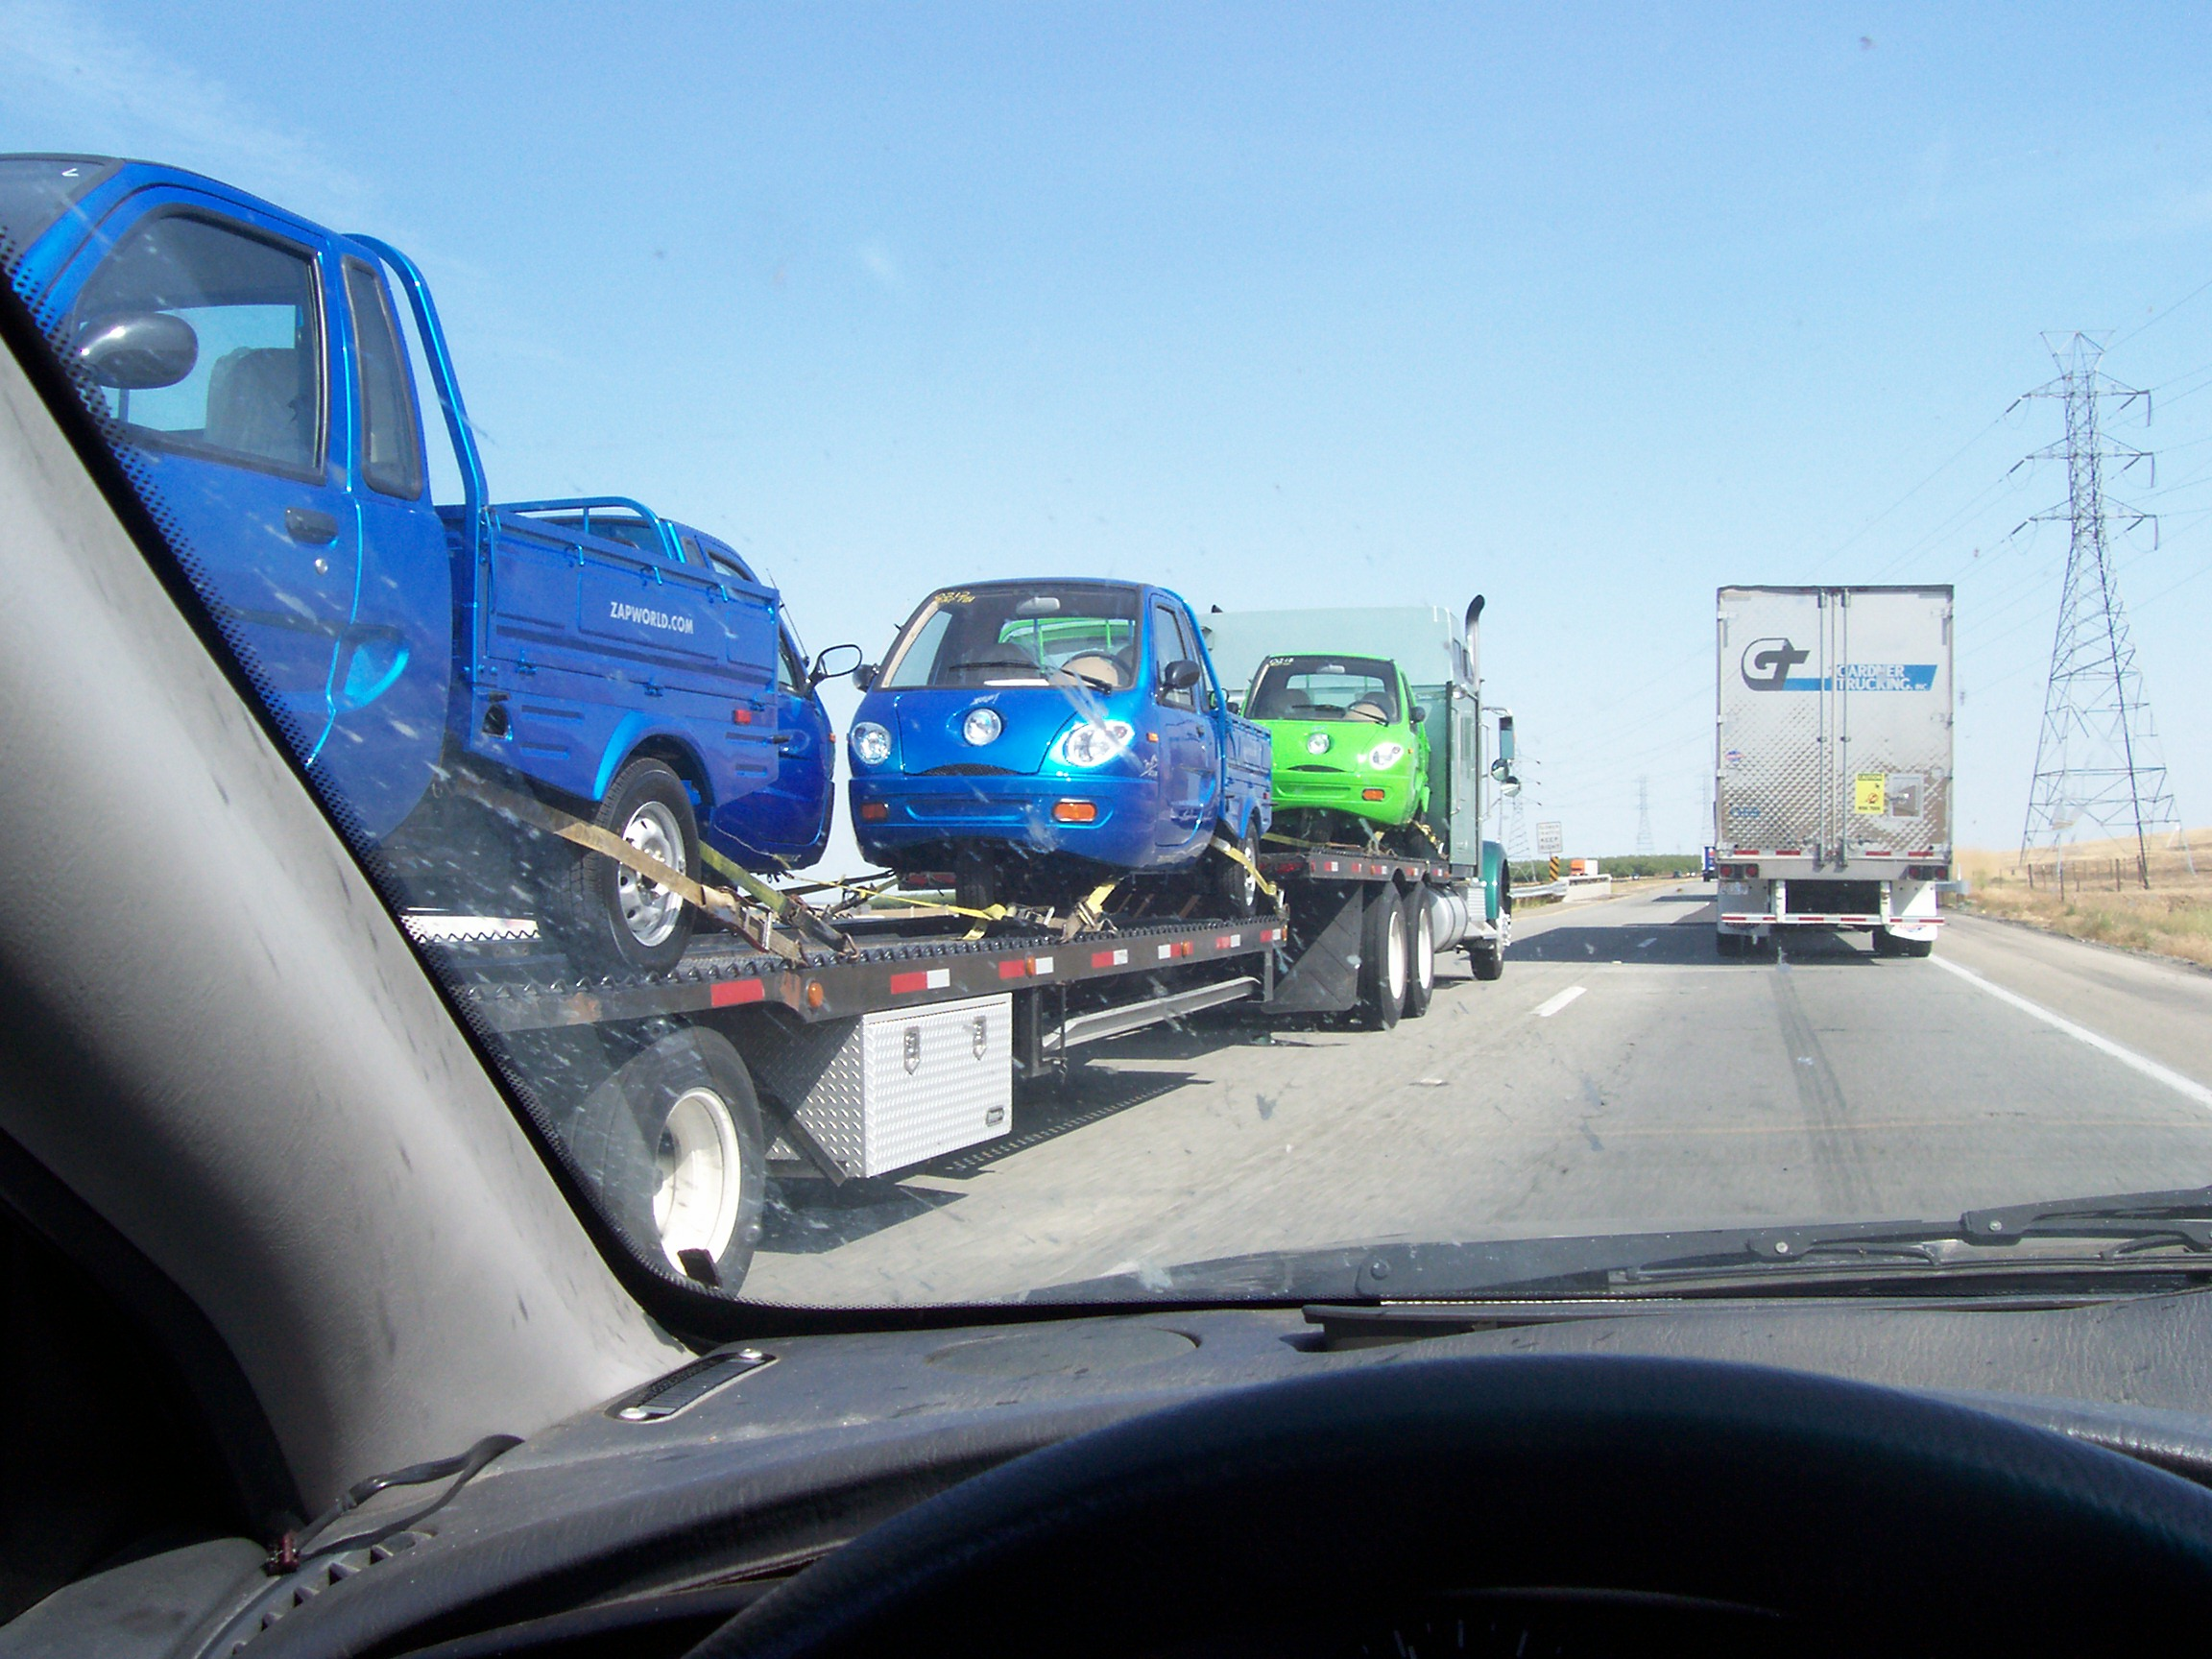 auto transporter hauling ZAP electric vehicles